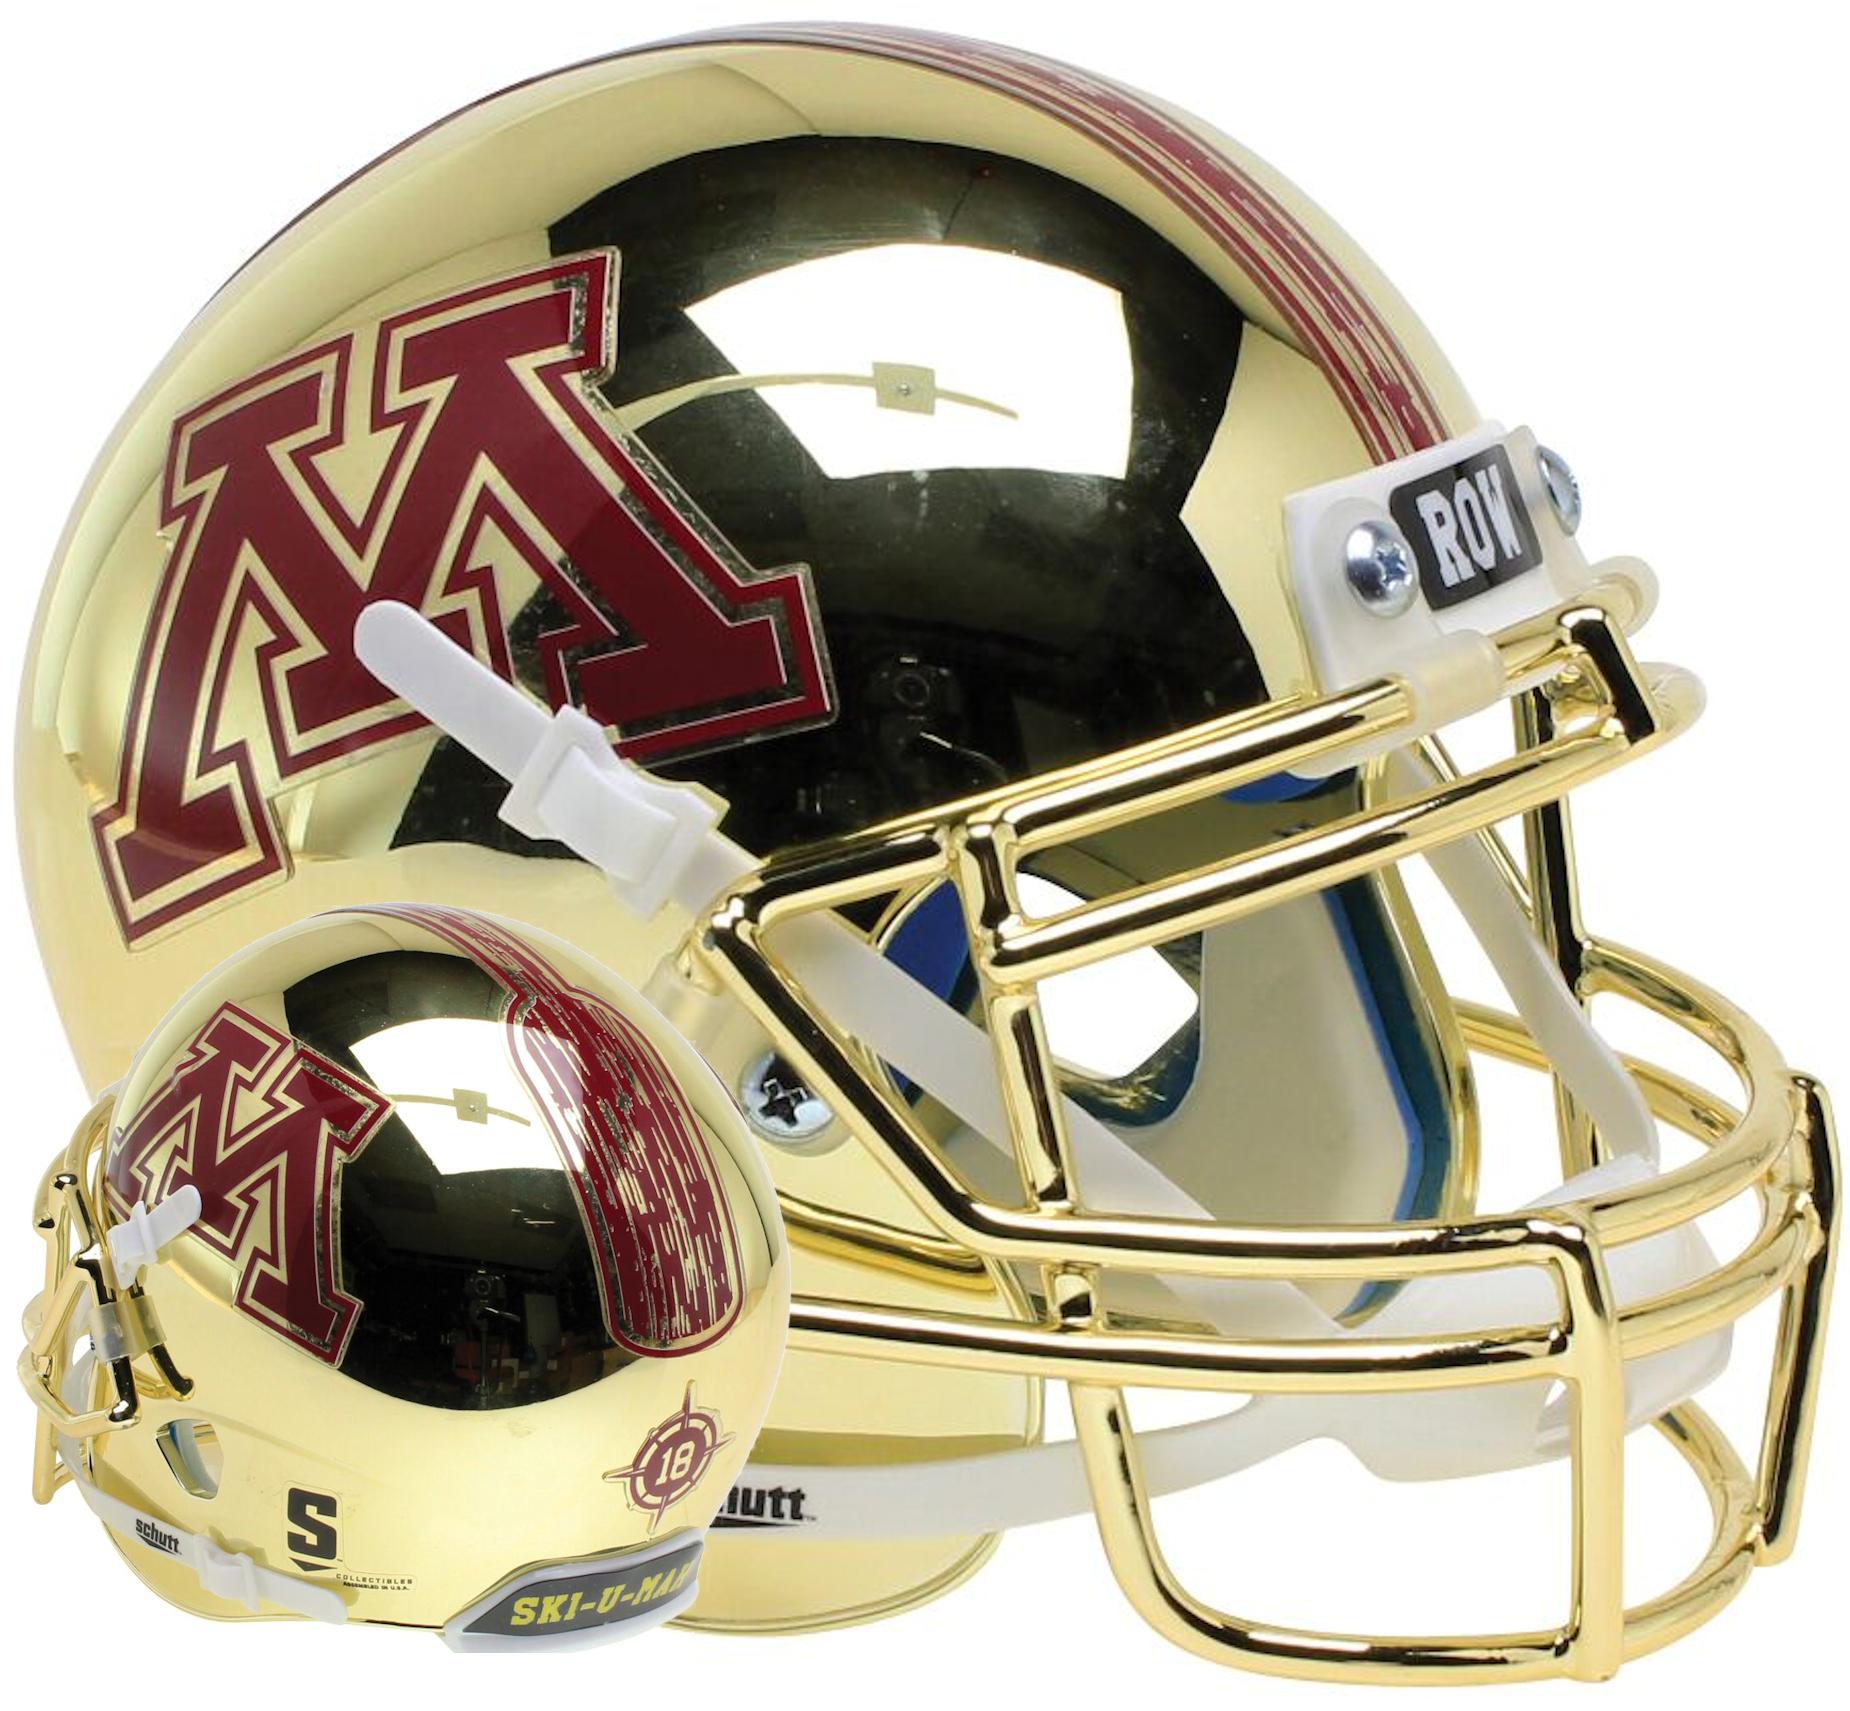 Minnesota Golden Gophers Mini XP Authentic Helmet Schutt <B>Gold Chrome</B>